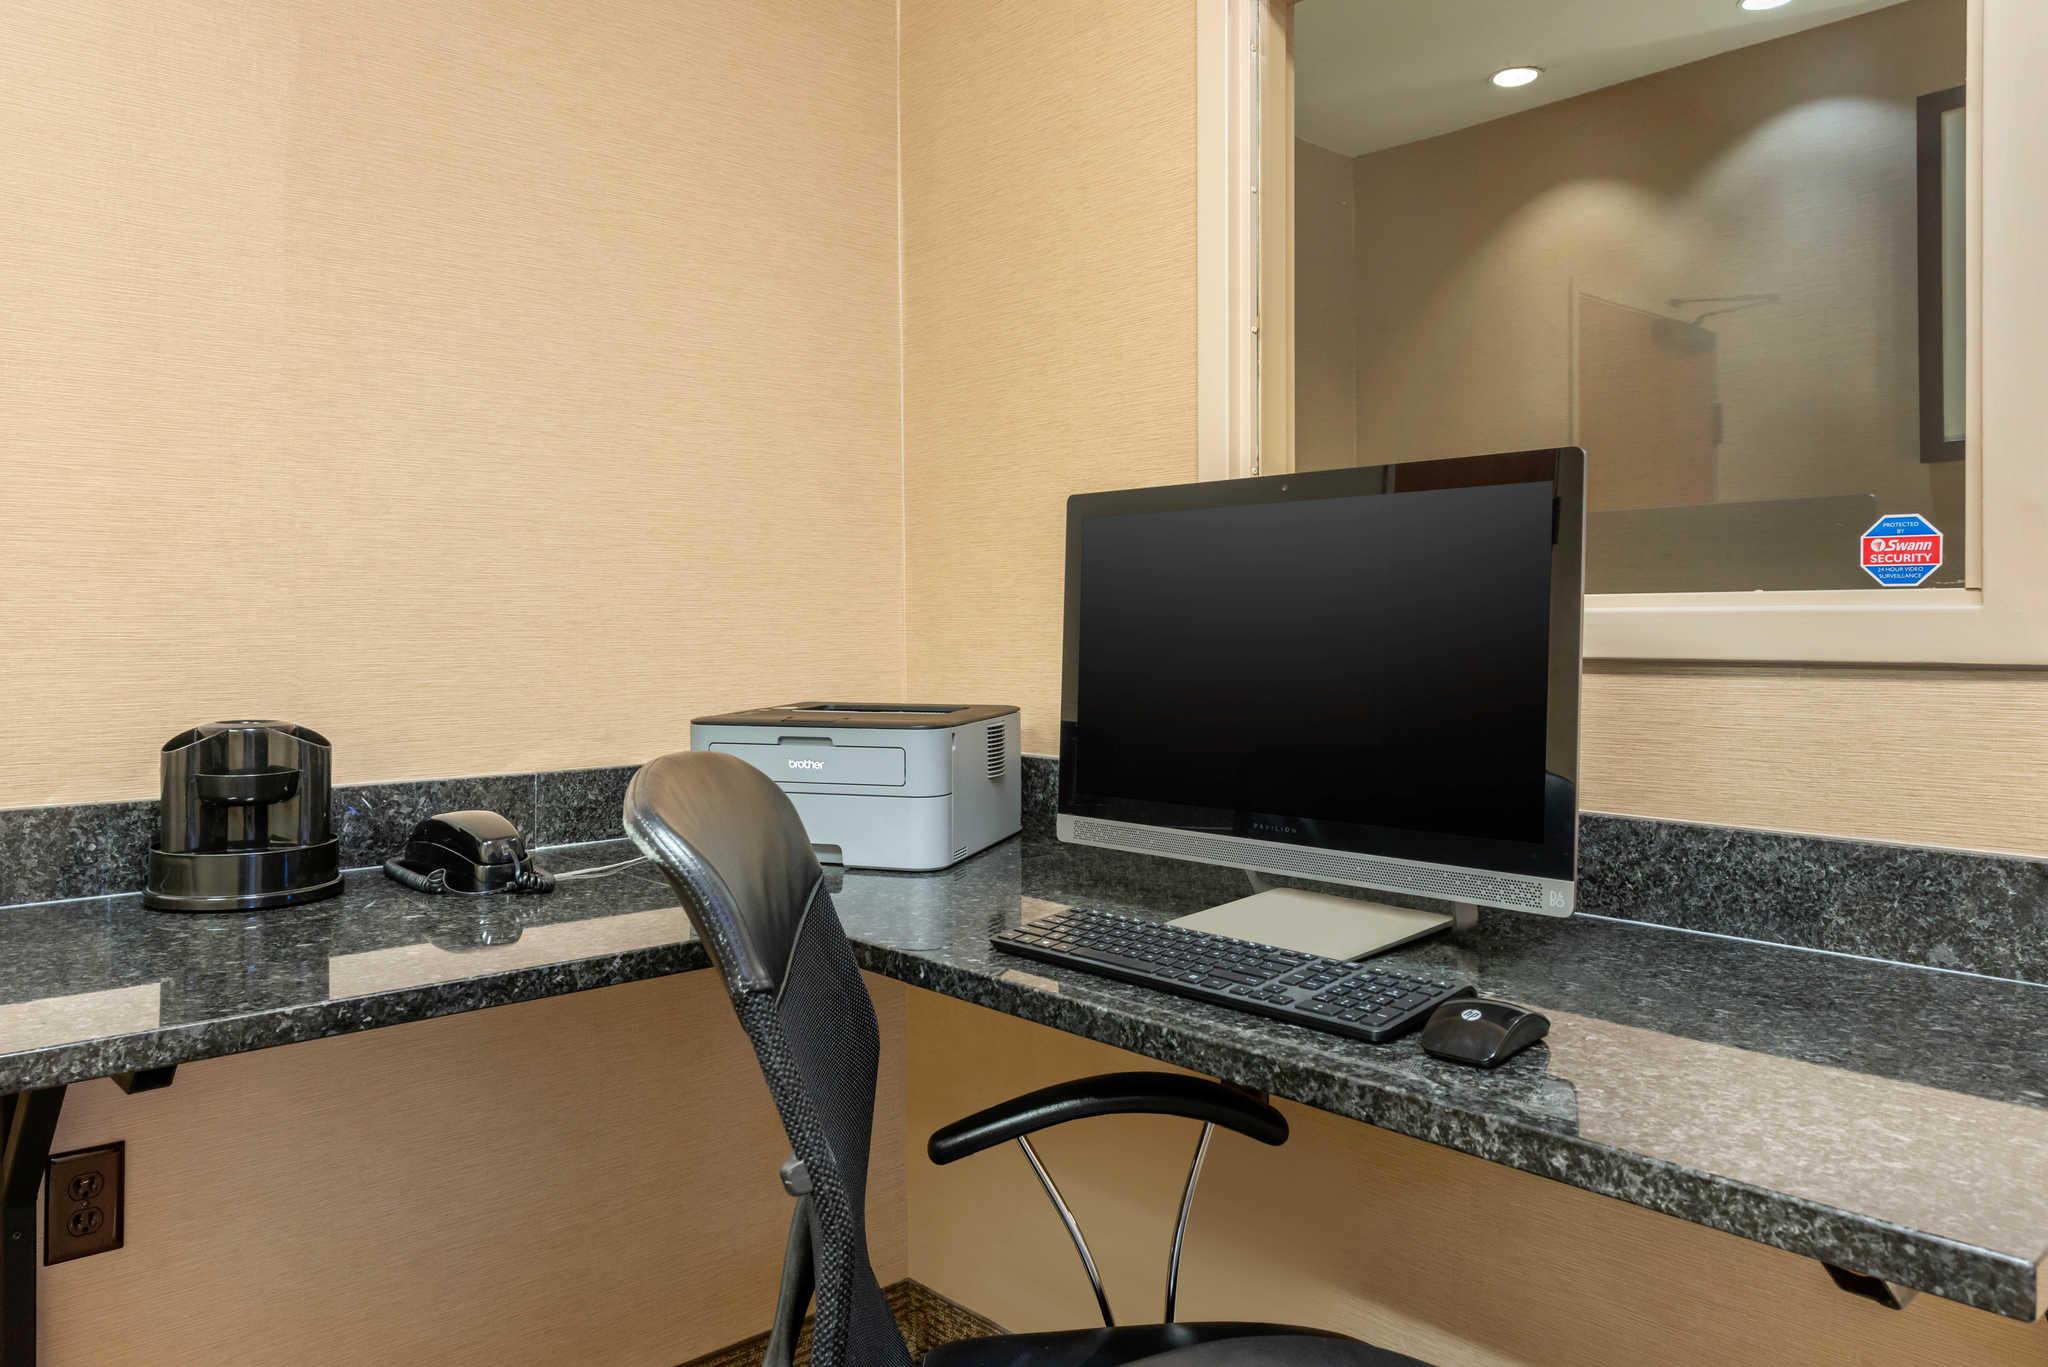 Comfort Inn DFW Airport North image 41